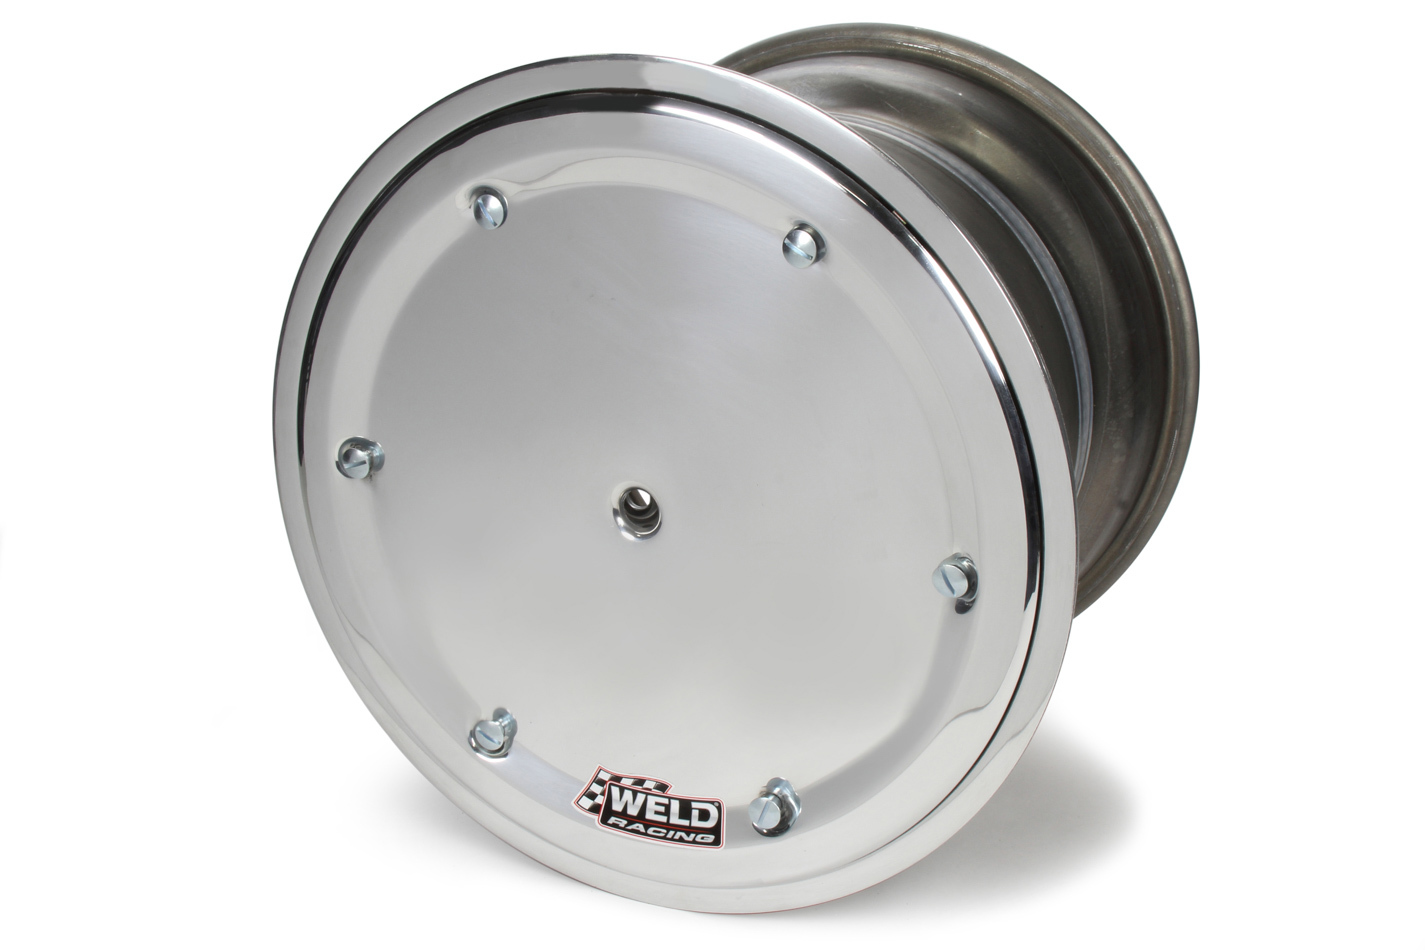 WELD RACING 15x14 Wide 5 XL 5in BS w/Inner B/L & Outer Cvr P/N - 559-5465-6